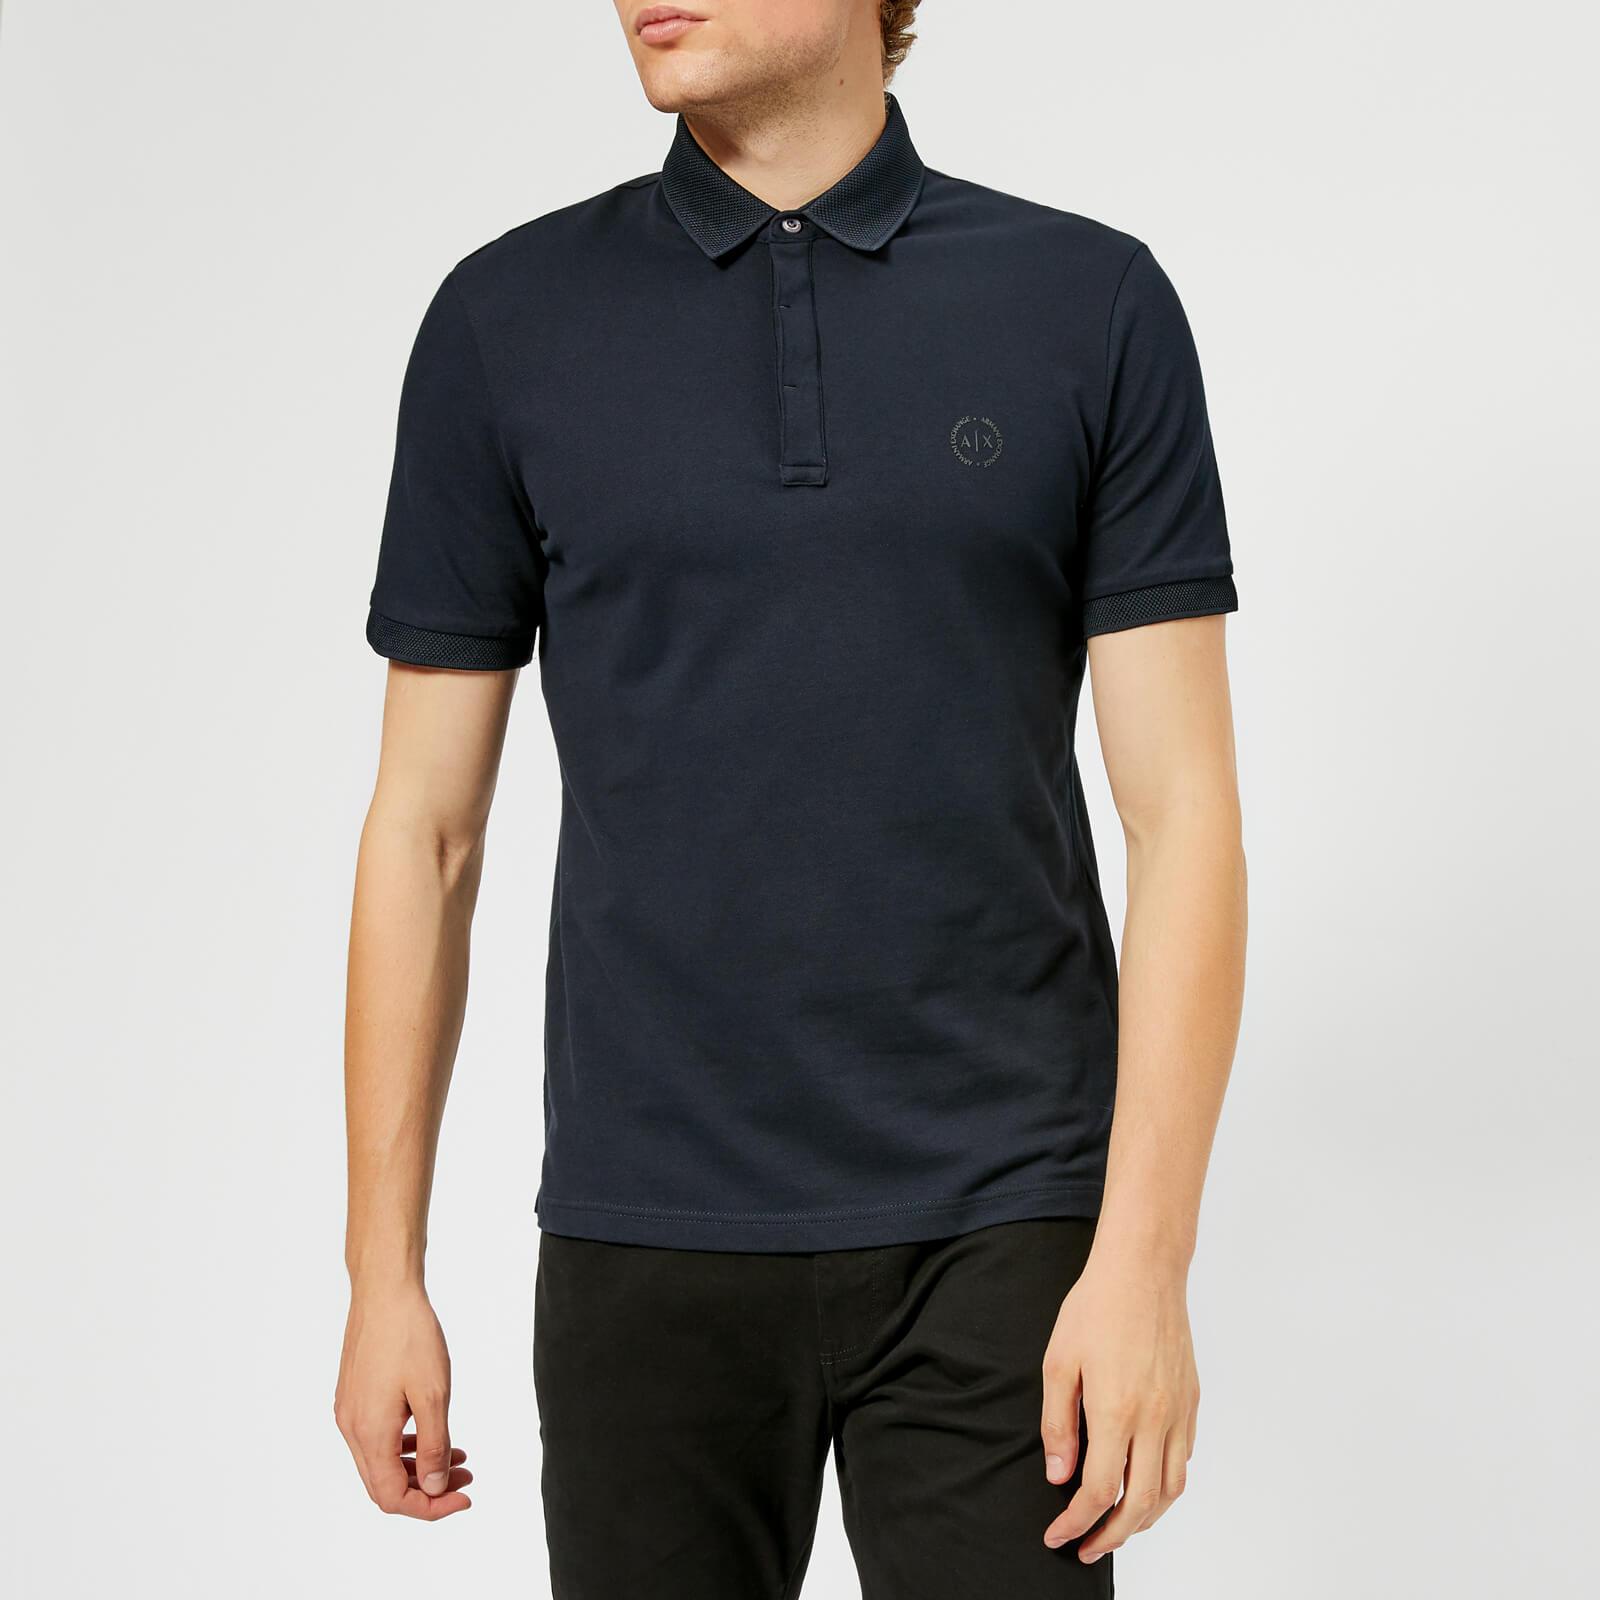 095c43936 Armani Exchange Men s Tonal Logo Polo Shirt - Navy Clothing